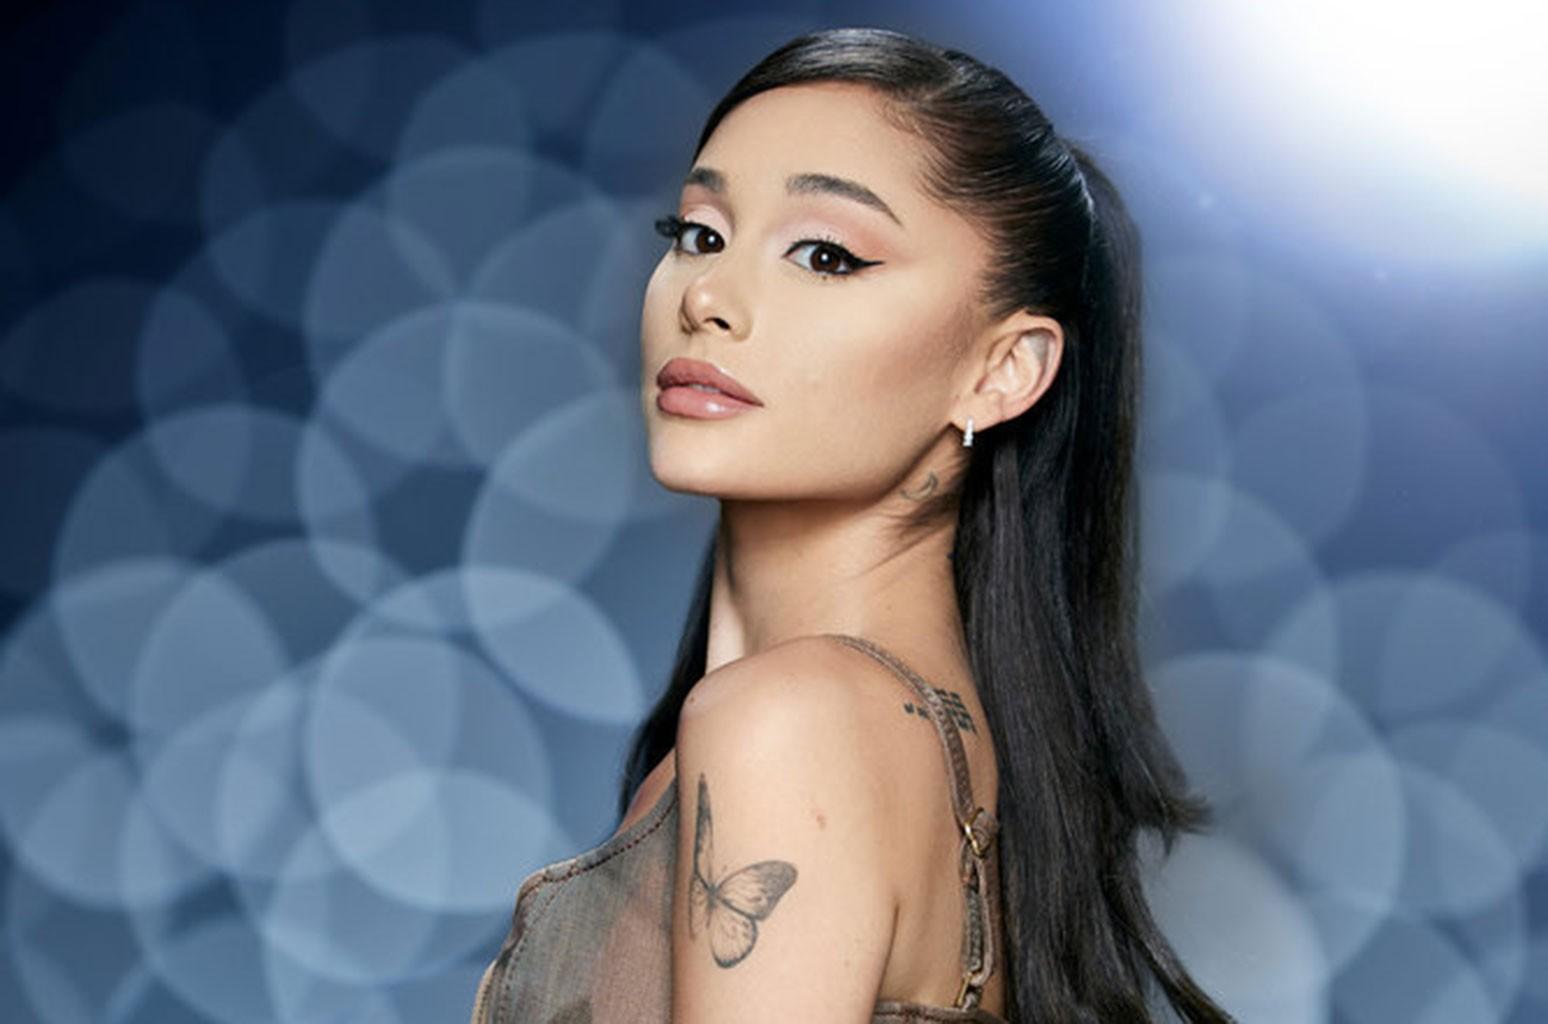 'The Voice' Contestant Sings Ariana Grande's 'POV'